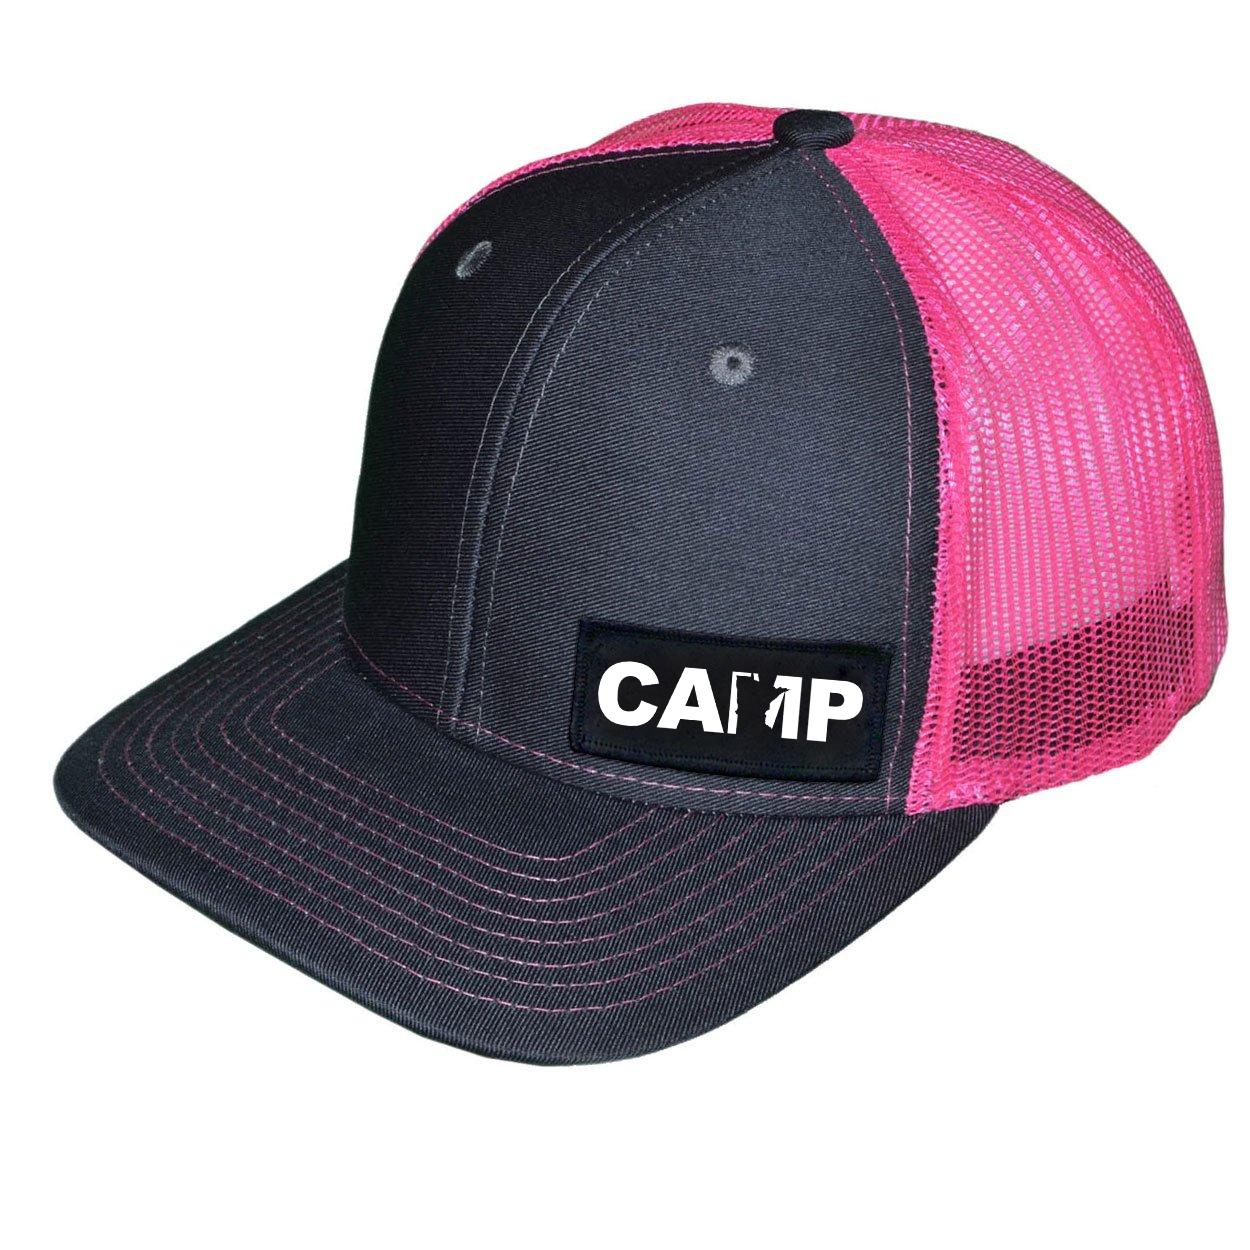 Camp Minnesota Night Out Woven Patch Snapback Trucker Hat Dark Gray/Neon Pink (White Logo)